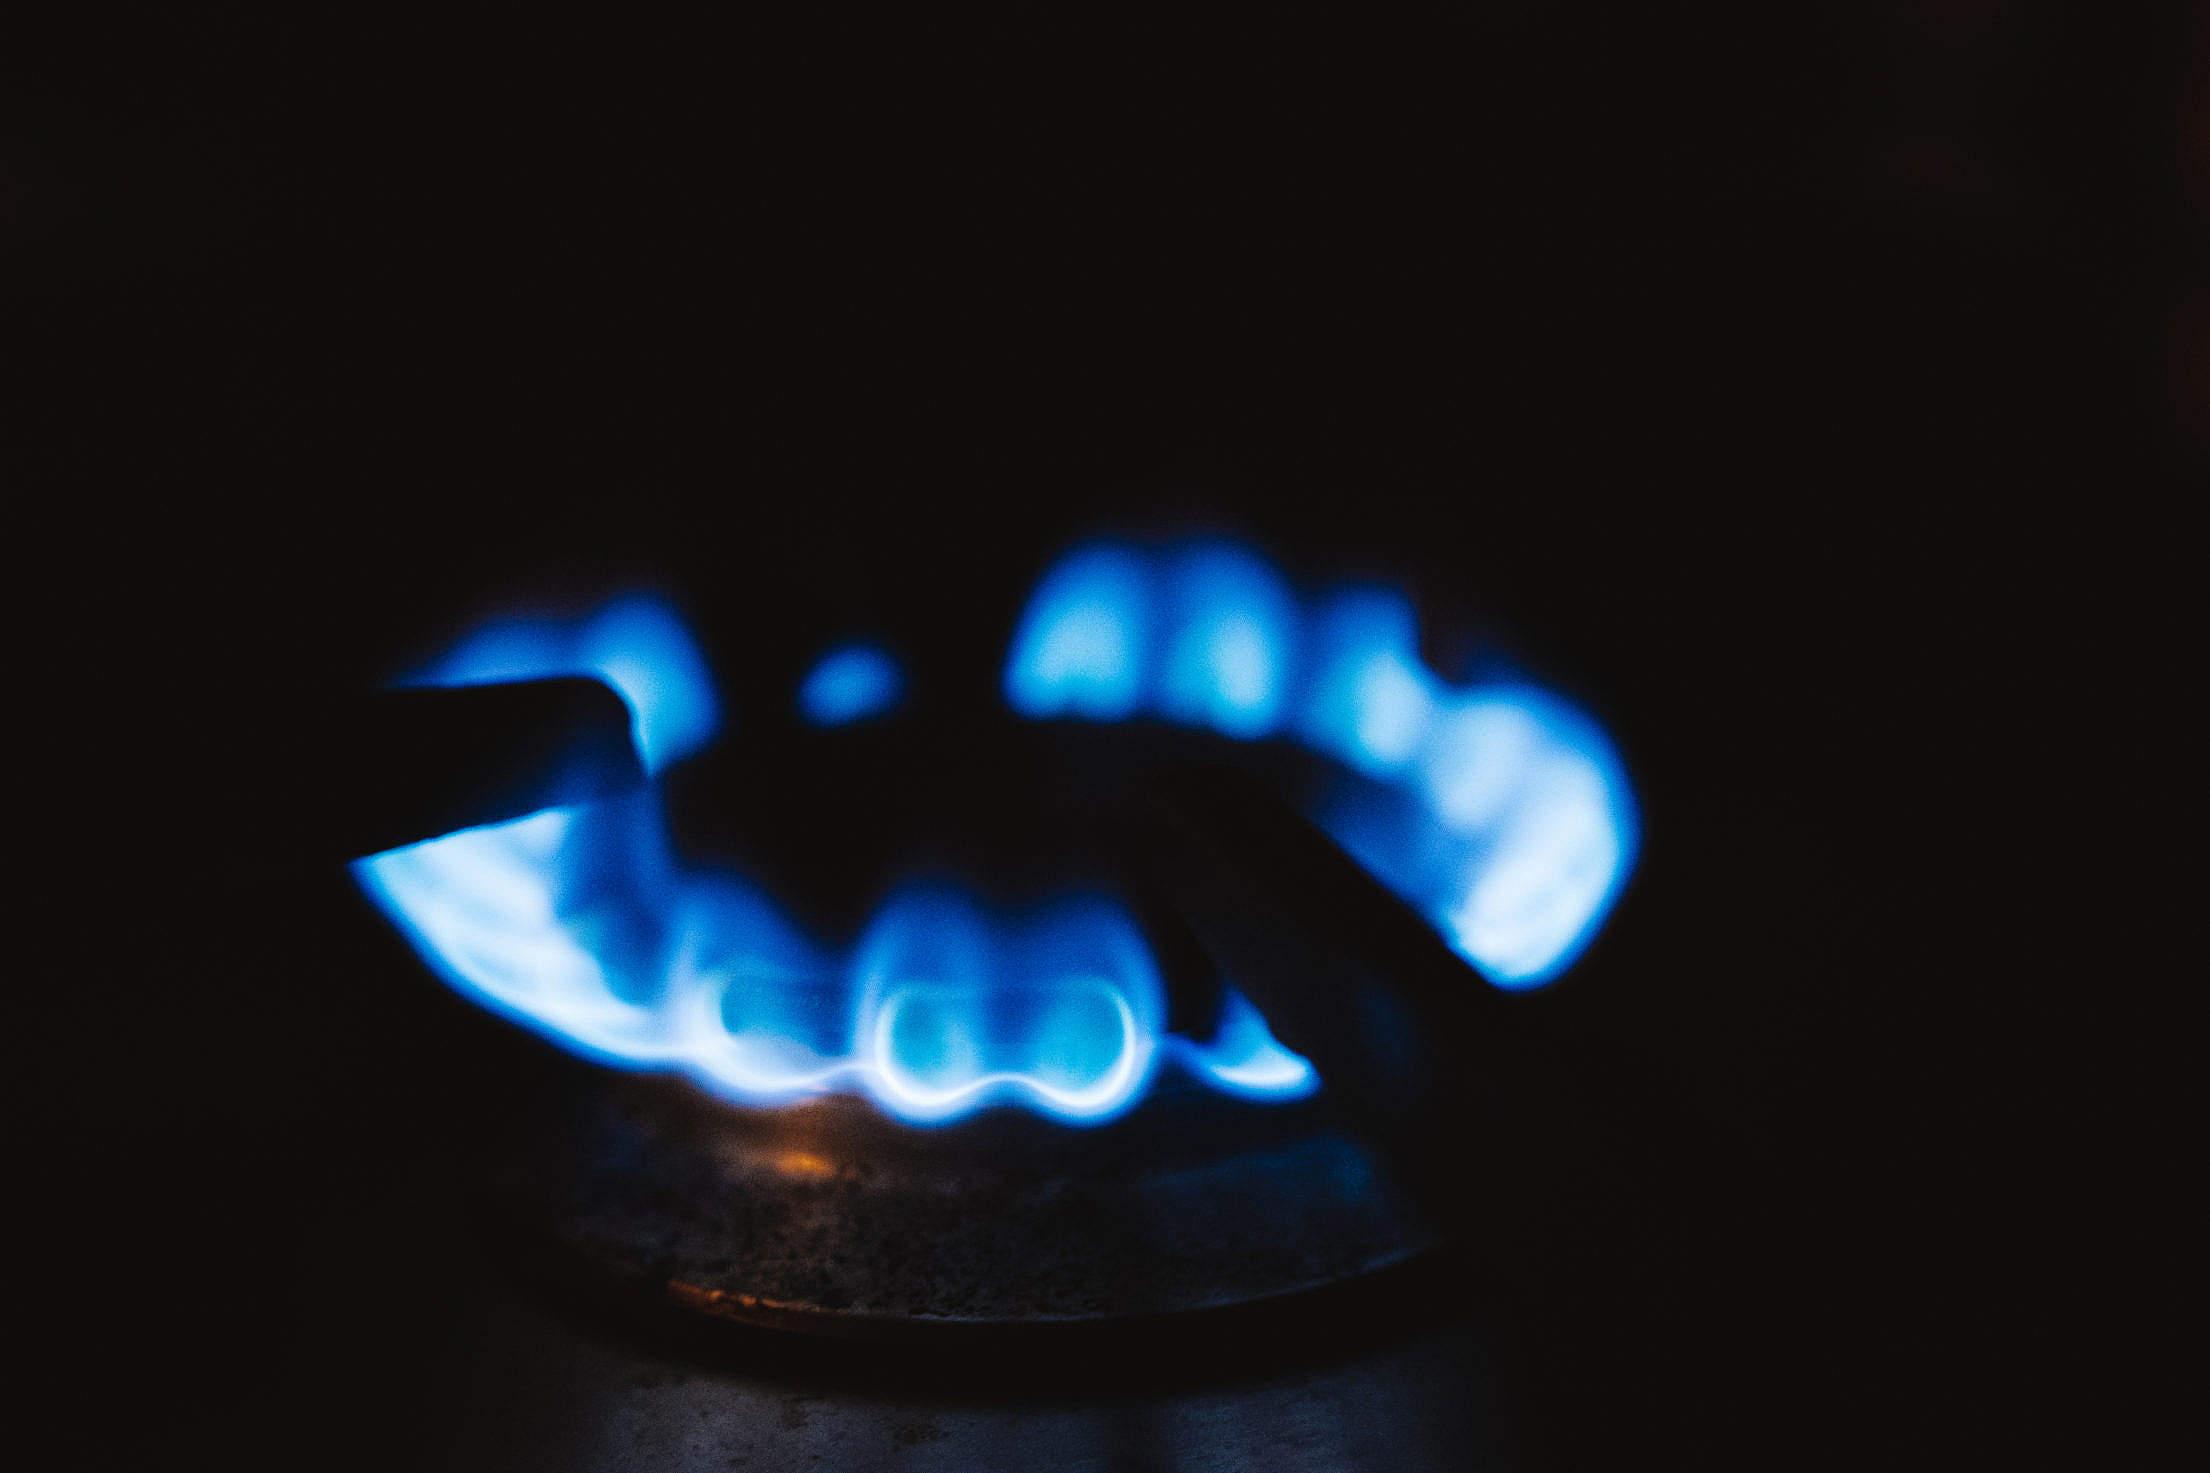 Gas Stove Burner Free Stock Photo